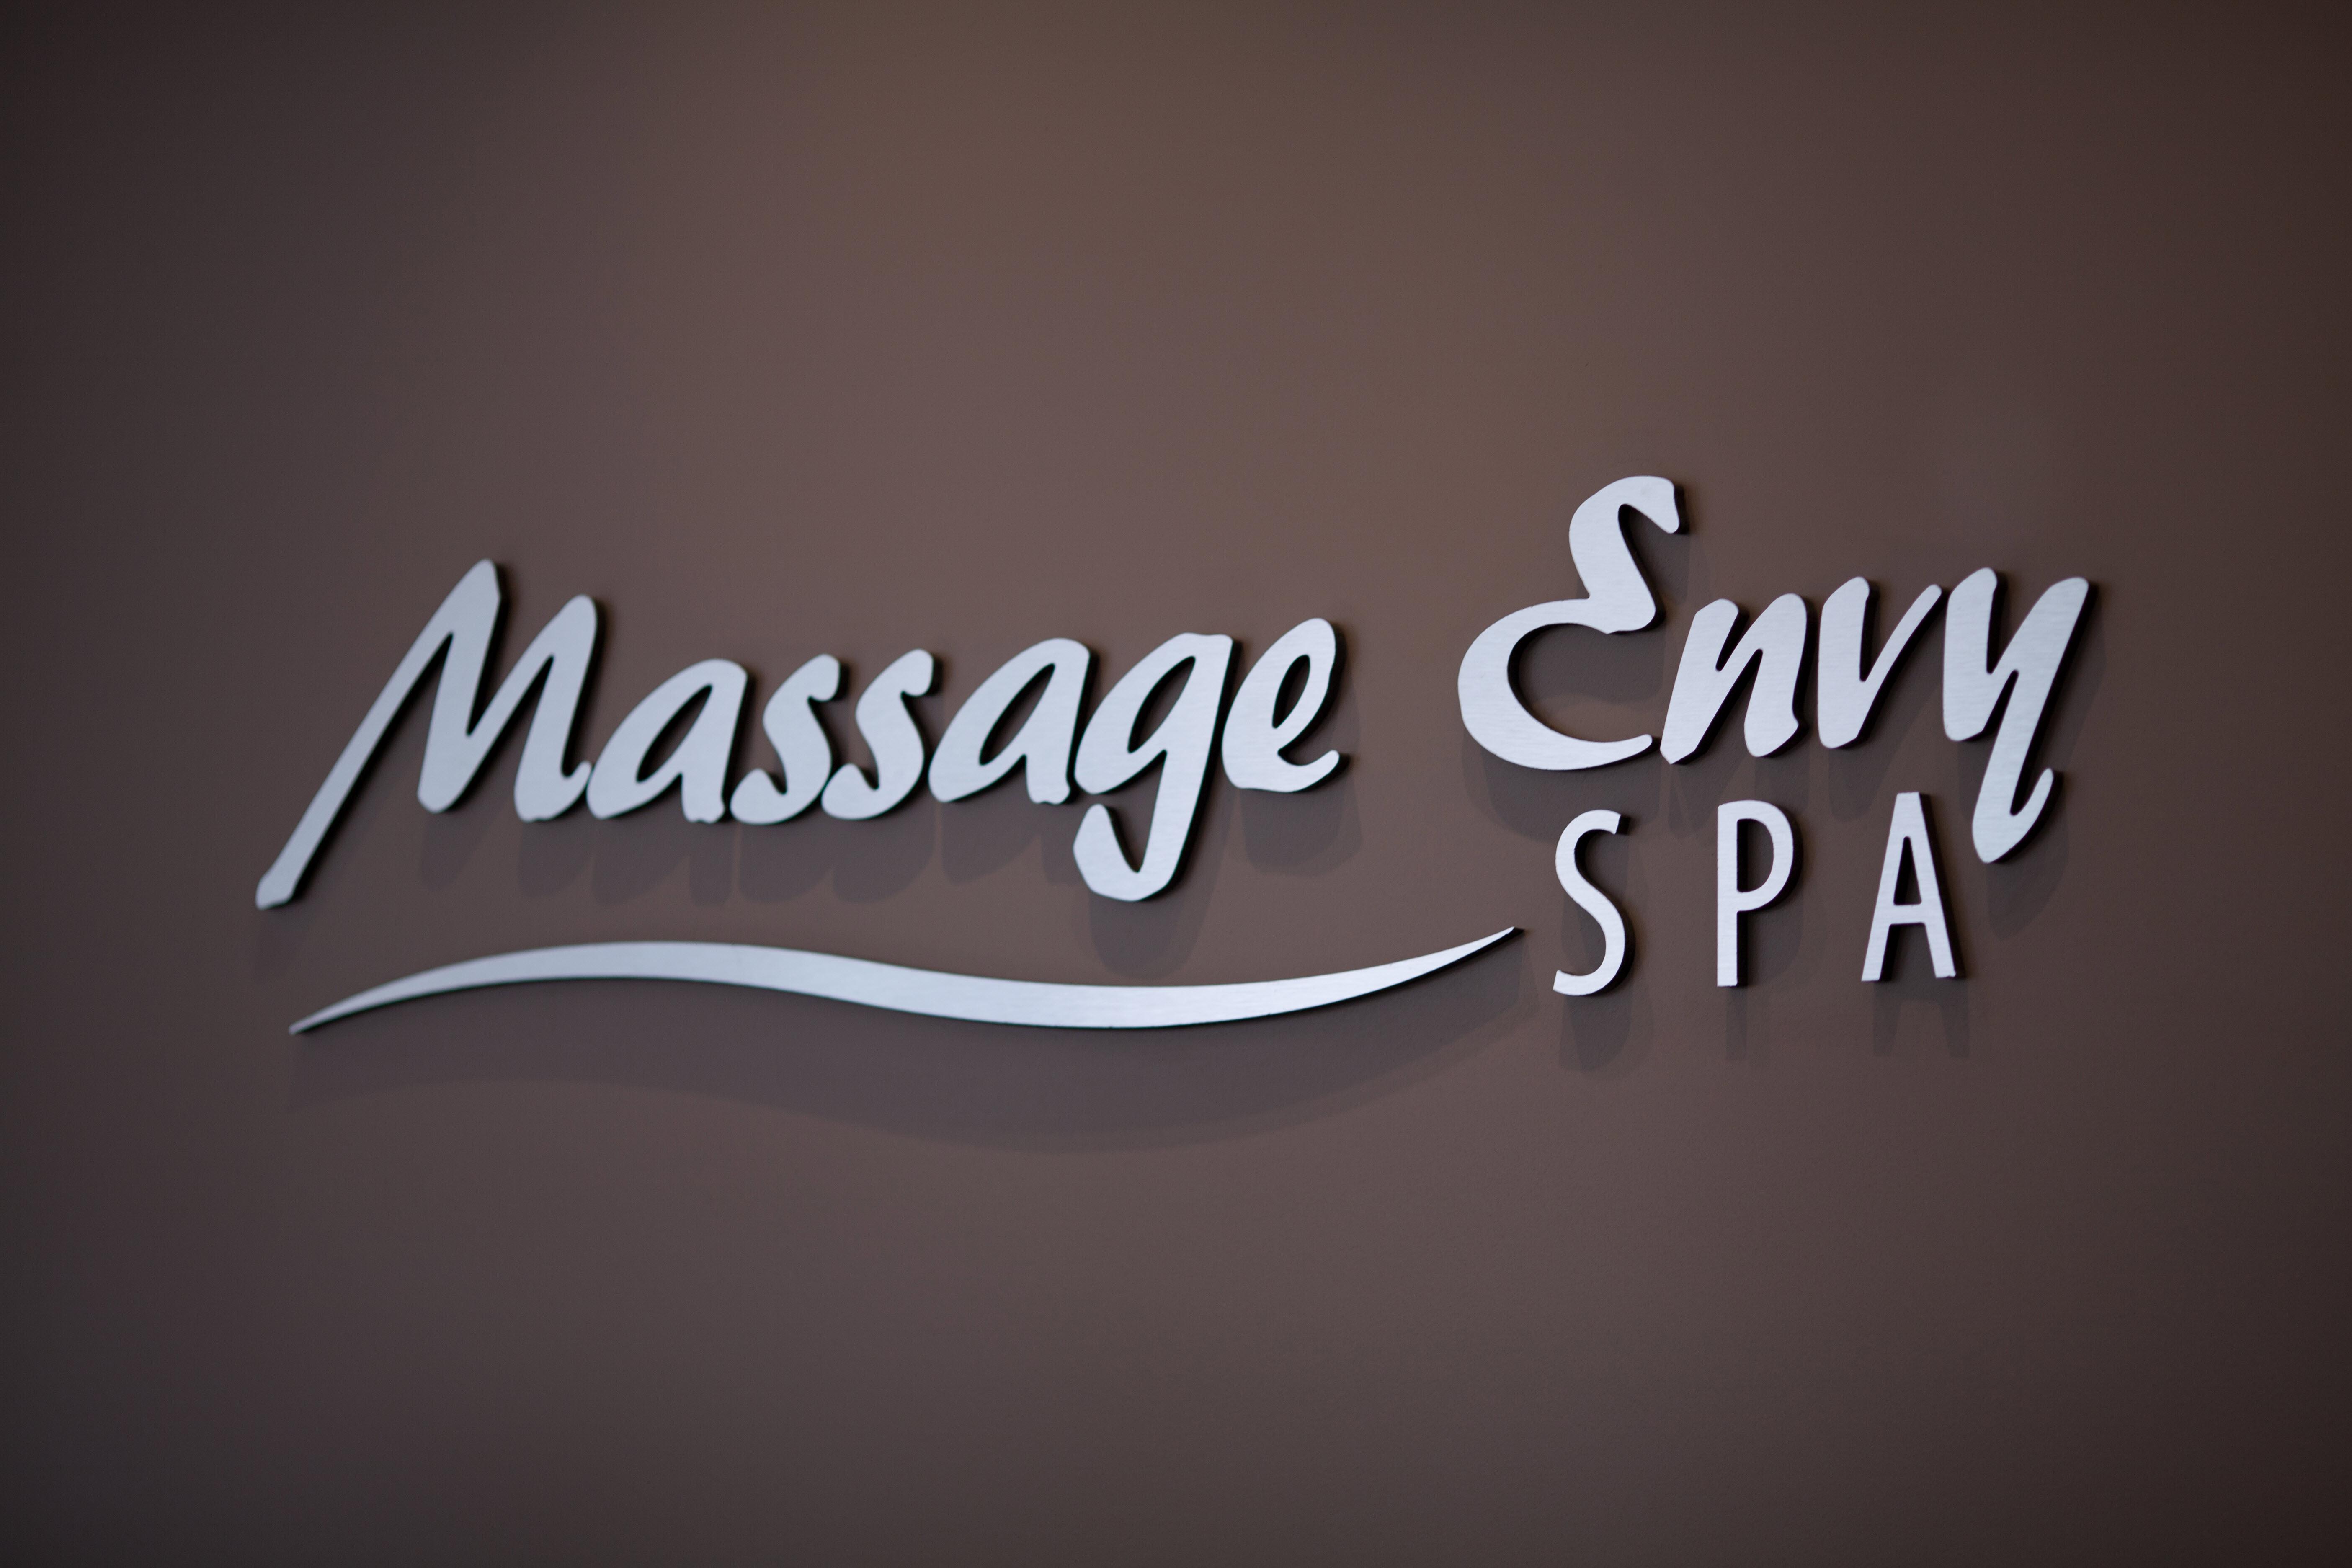 Massage Envy Spa - Sarasota South